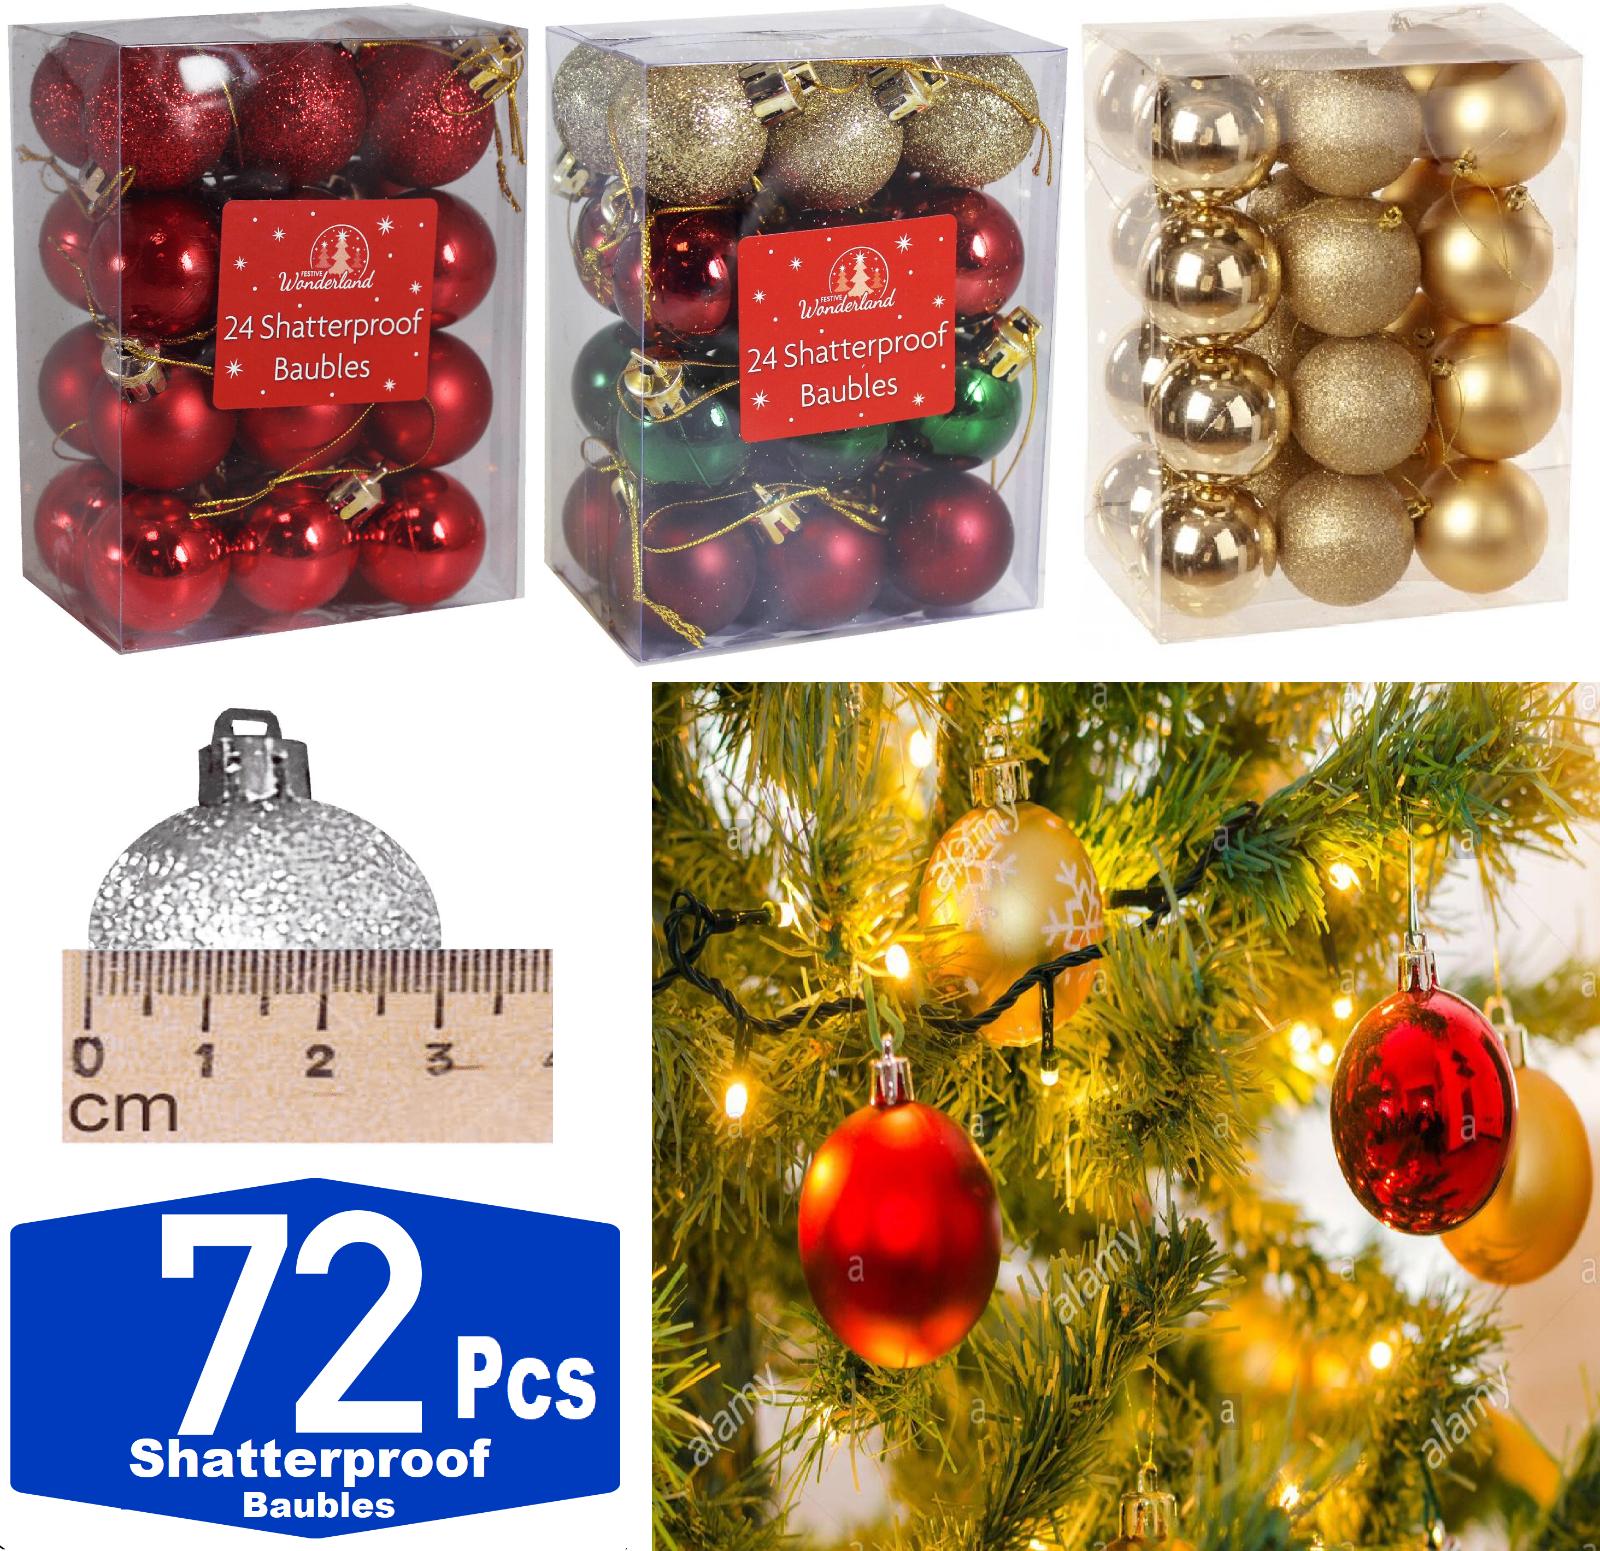 30 Luxury Shatterproof Christmas Baubles Tree Decorations Eucalyptus Mint Green For Sale Ebay